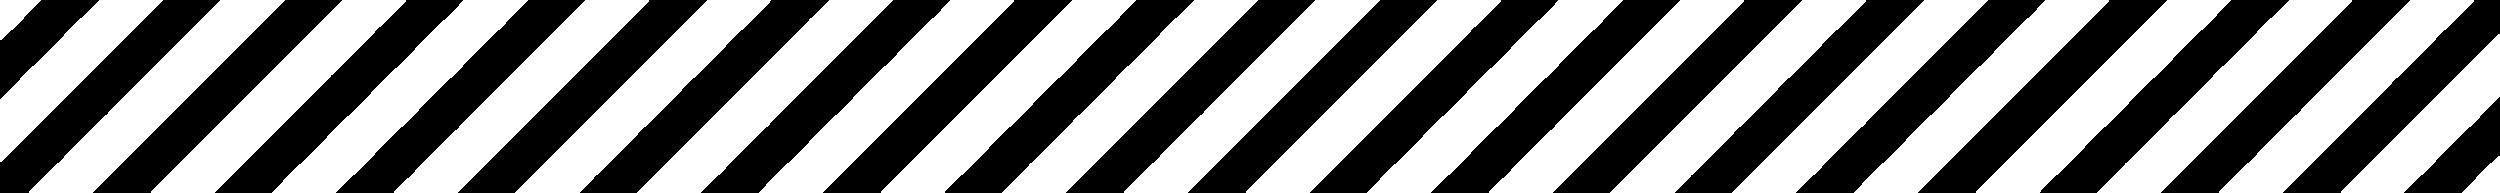 stripes hazem talaat.png